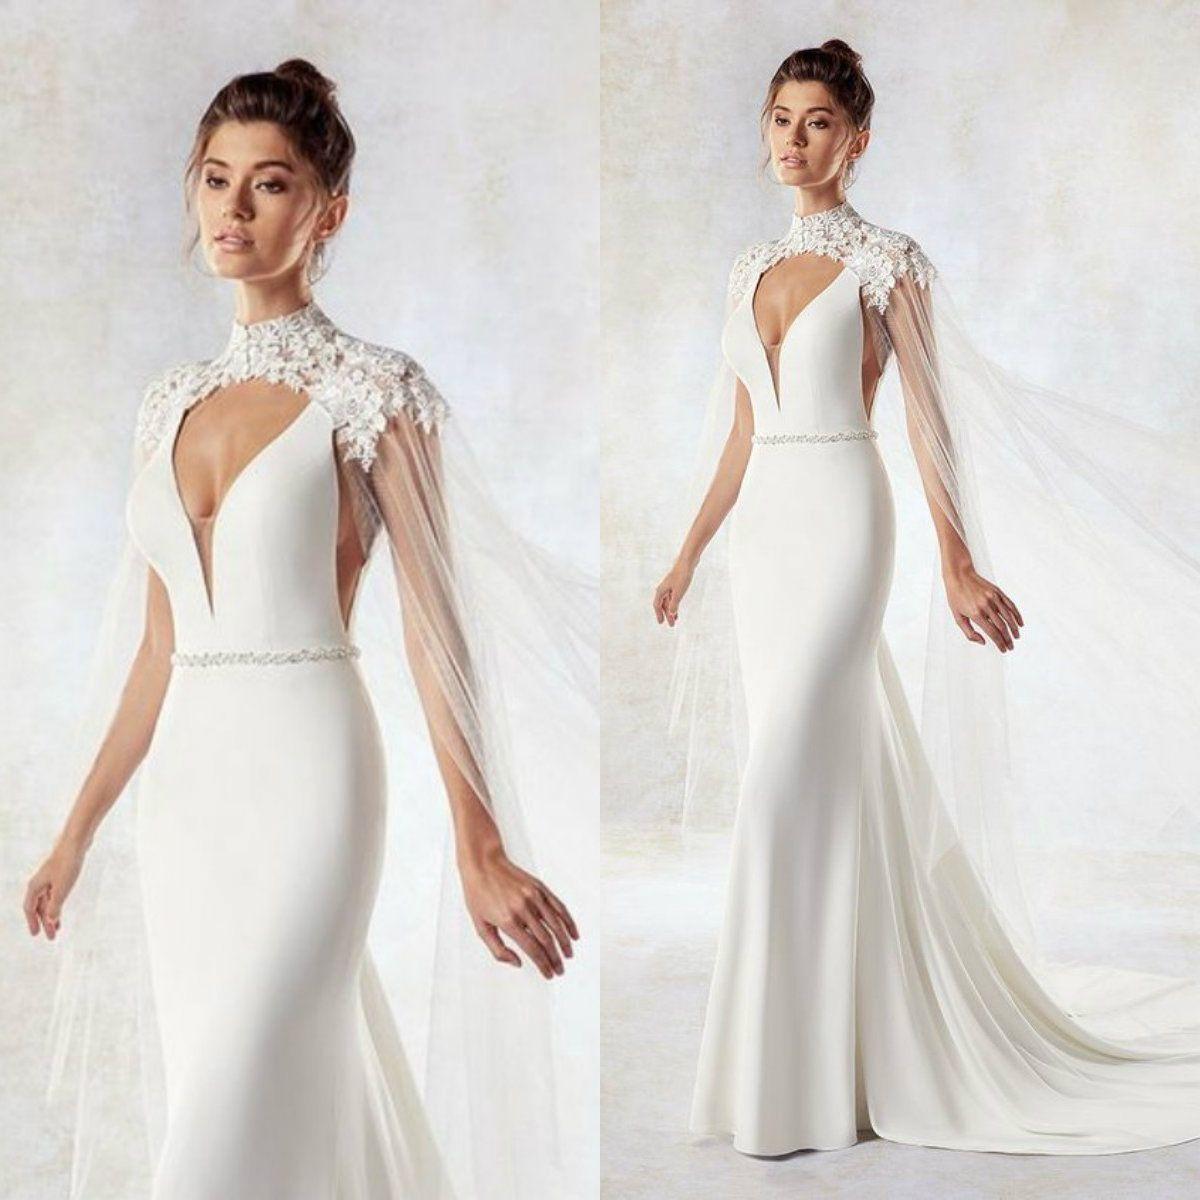 0f1c5d7e311 Eddy K Bridal Jackets Custom Made 2019 High Collar Lace Appliqued ...